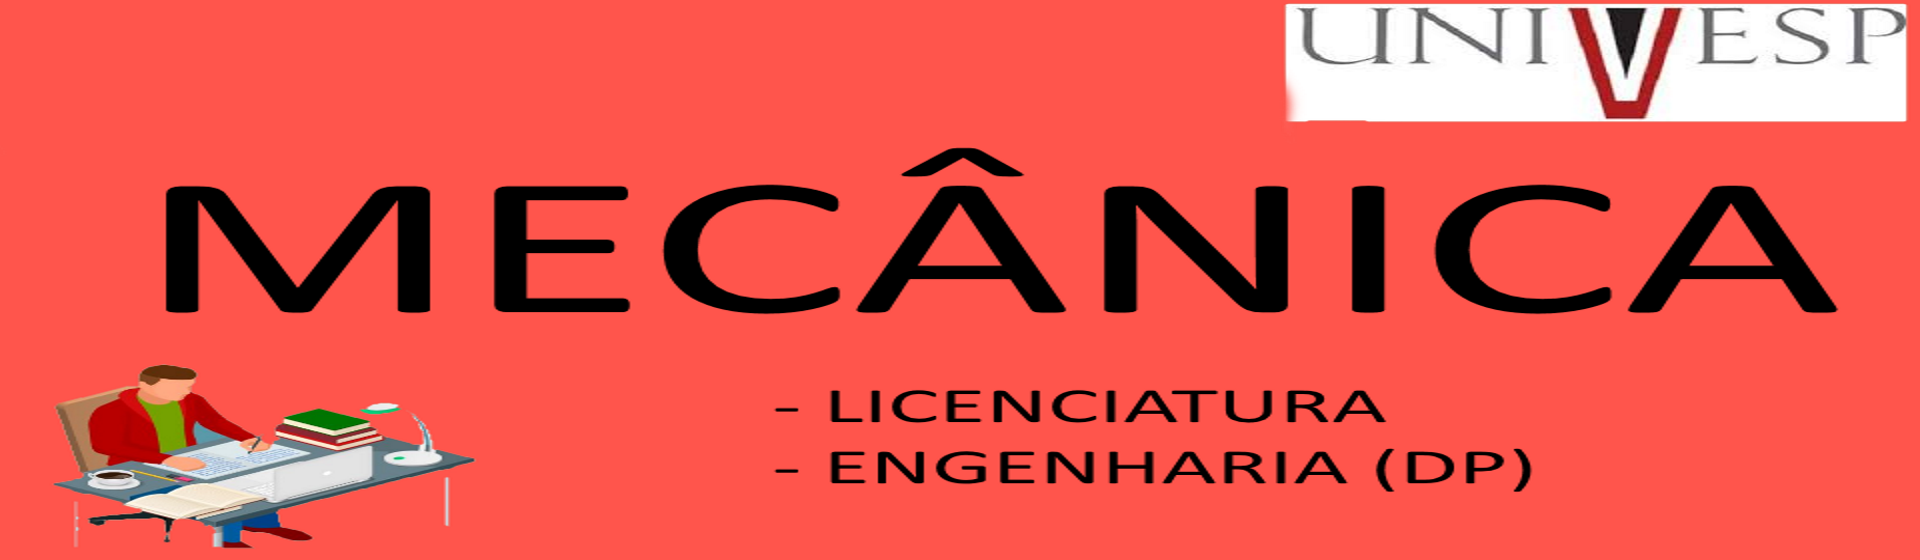 Banner%20mecanica